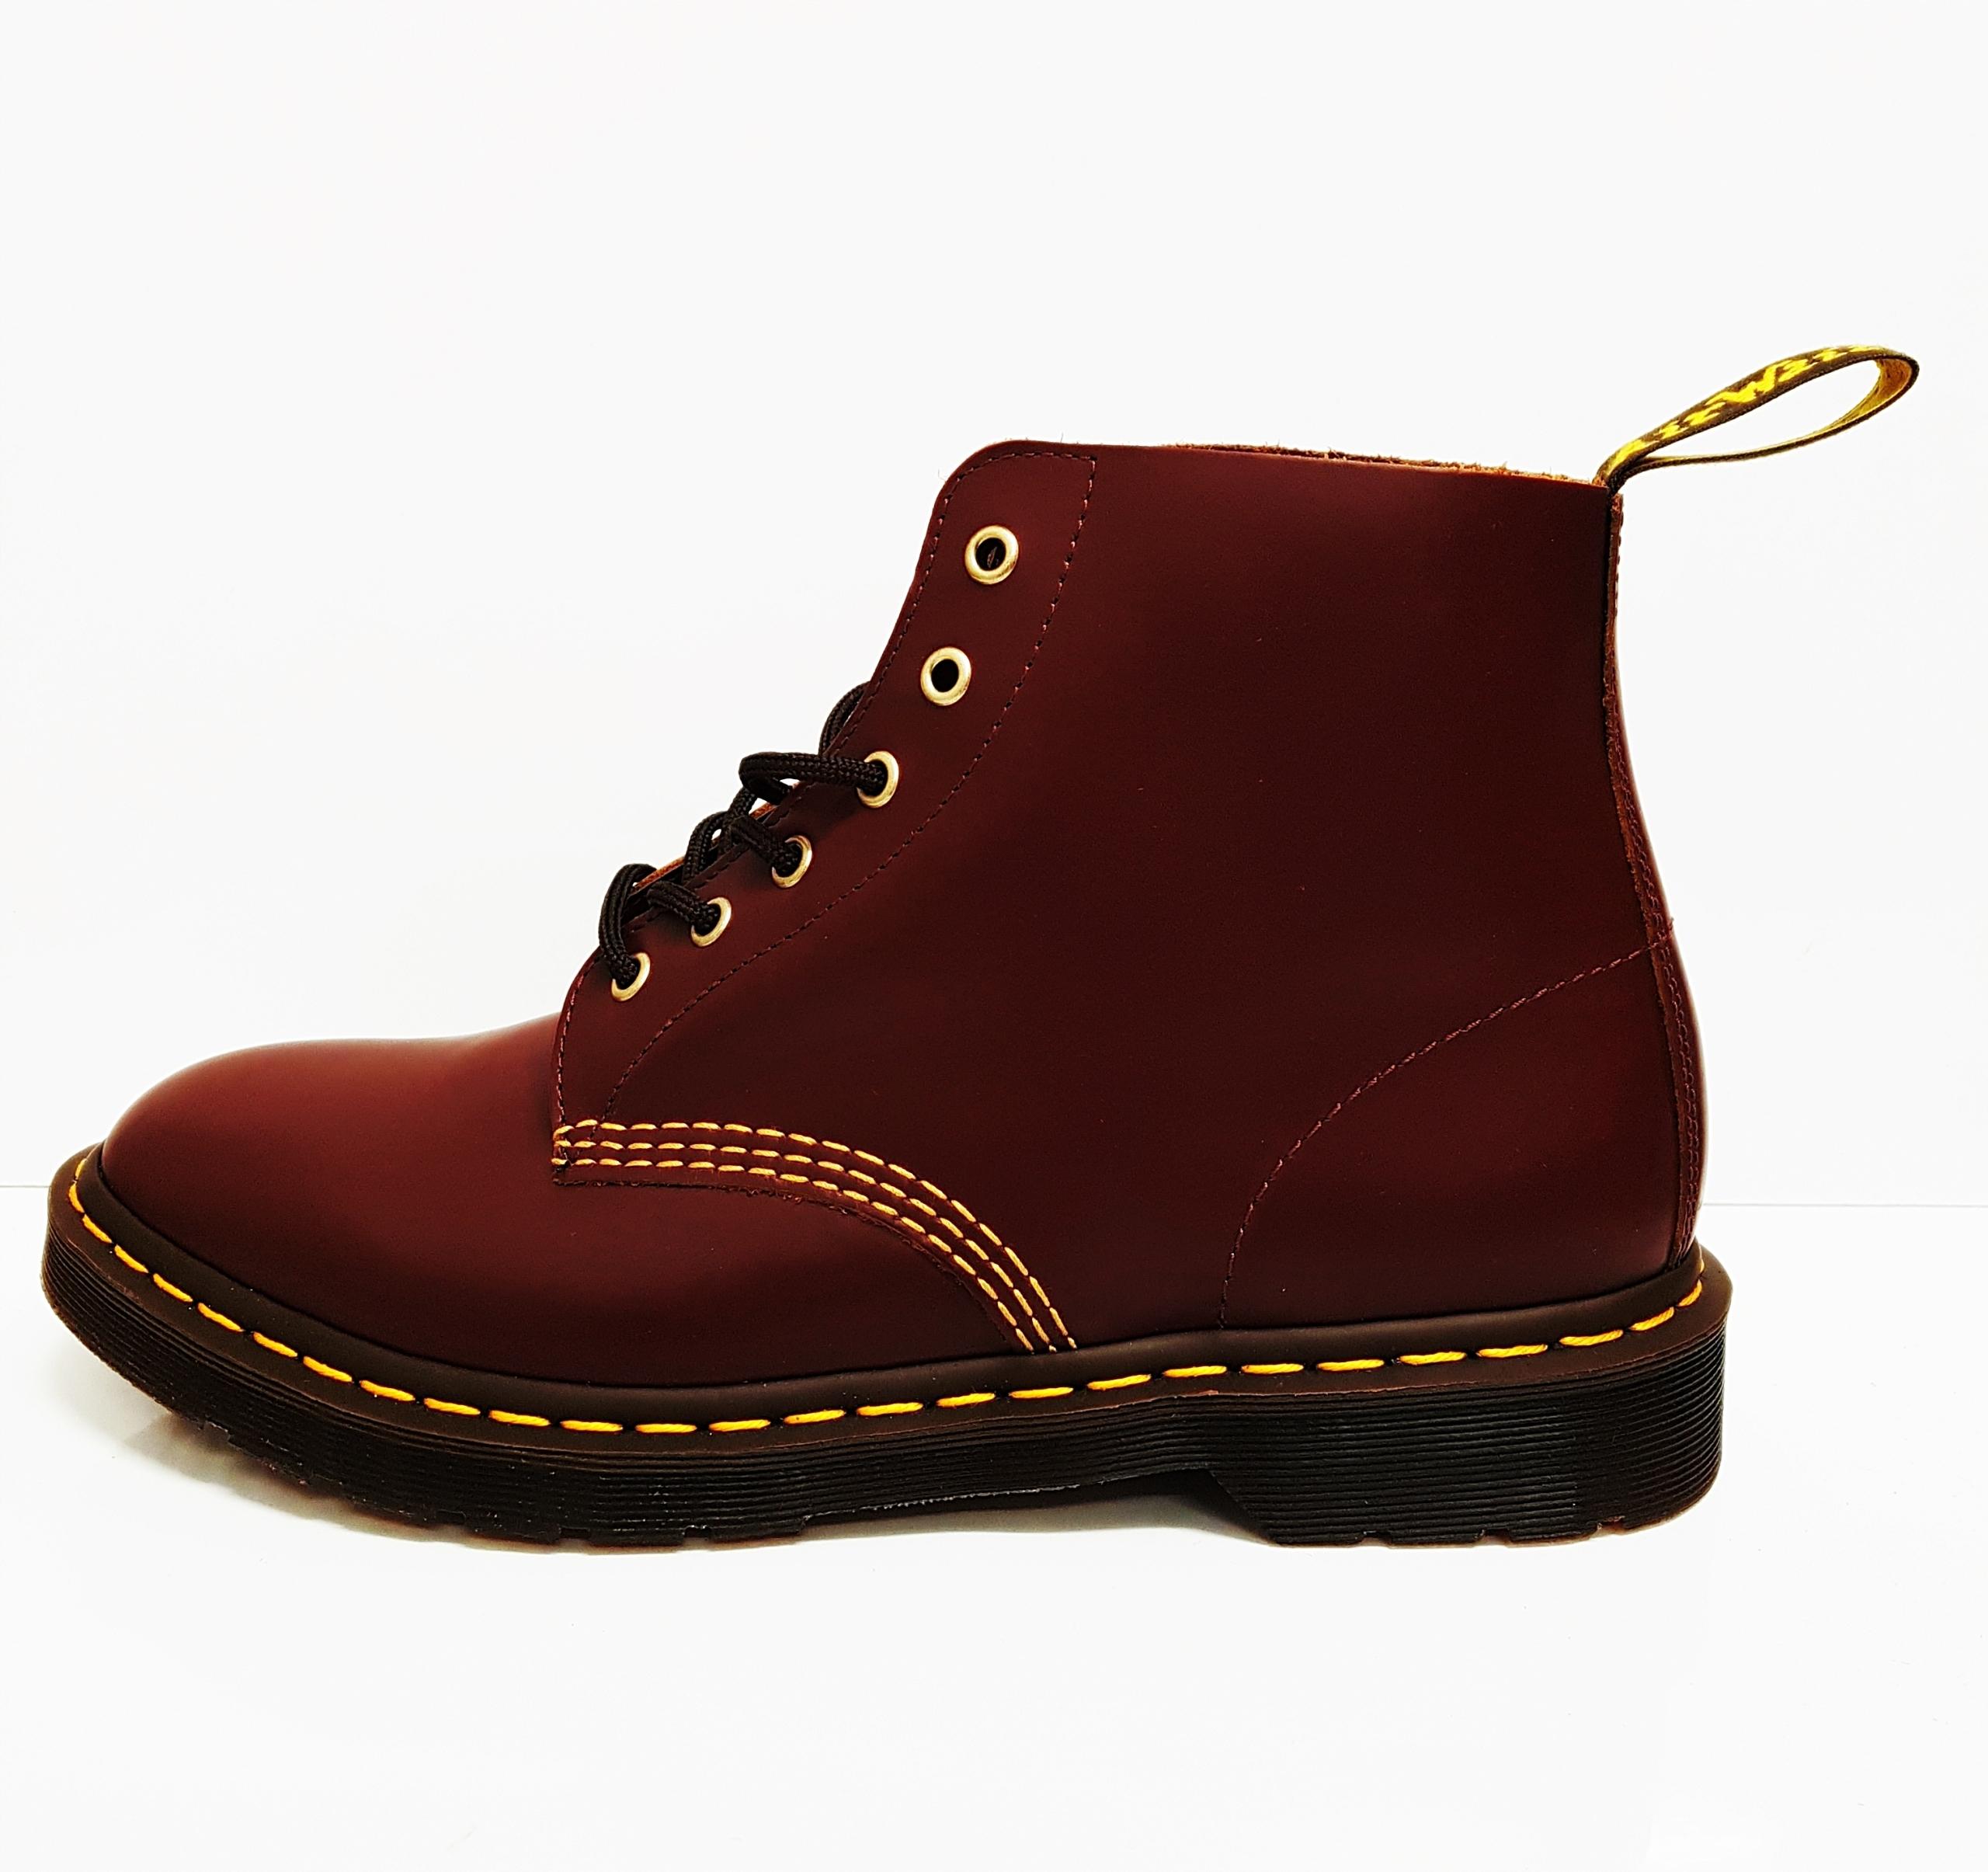 eleganckie buty na stopach o buty jesienne BUTY MĘSKIE GLANY DR. MARTENS 44 101 ARC